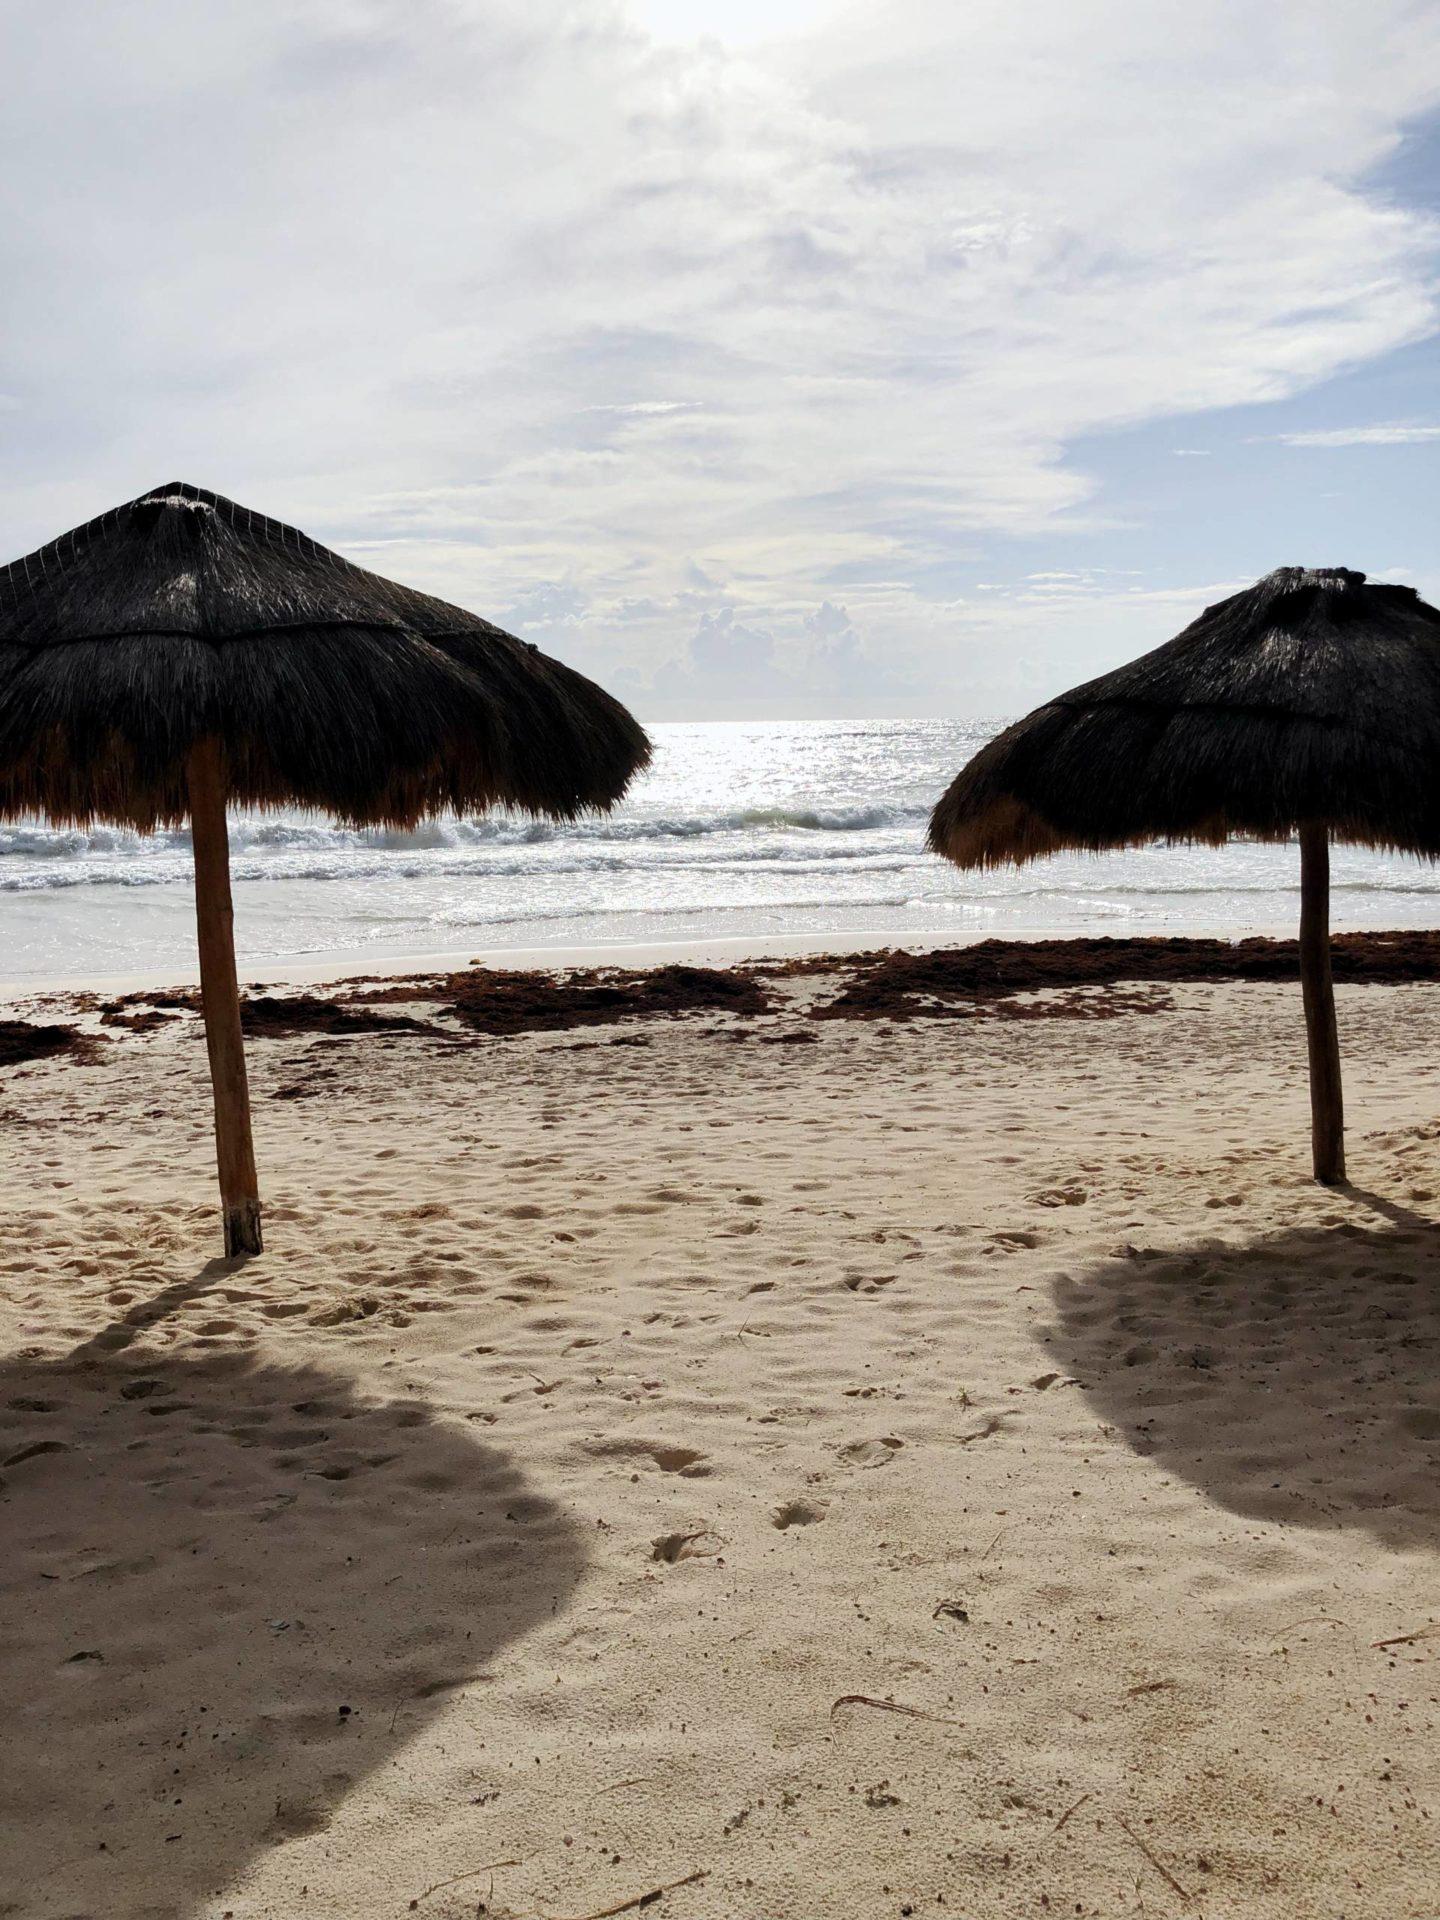 CityGuide : Mexique – Mexico, Tulum, Holbox, Oaxaca, Playa del Carmen